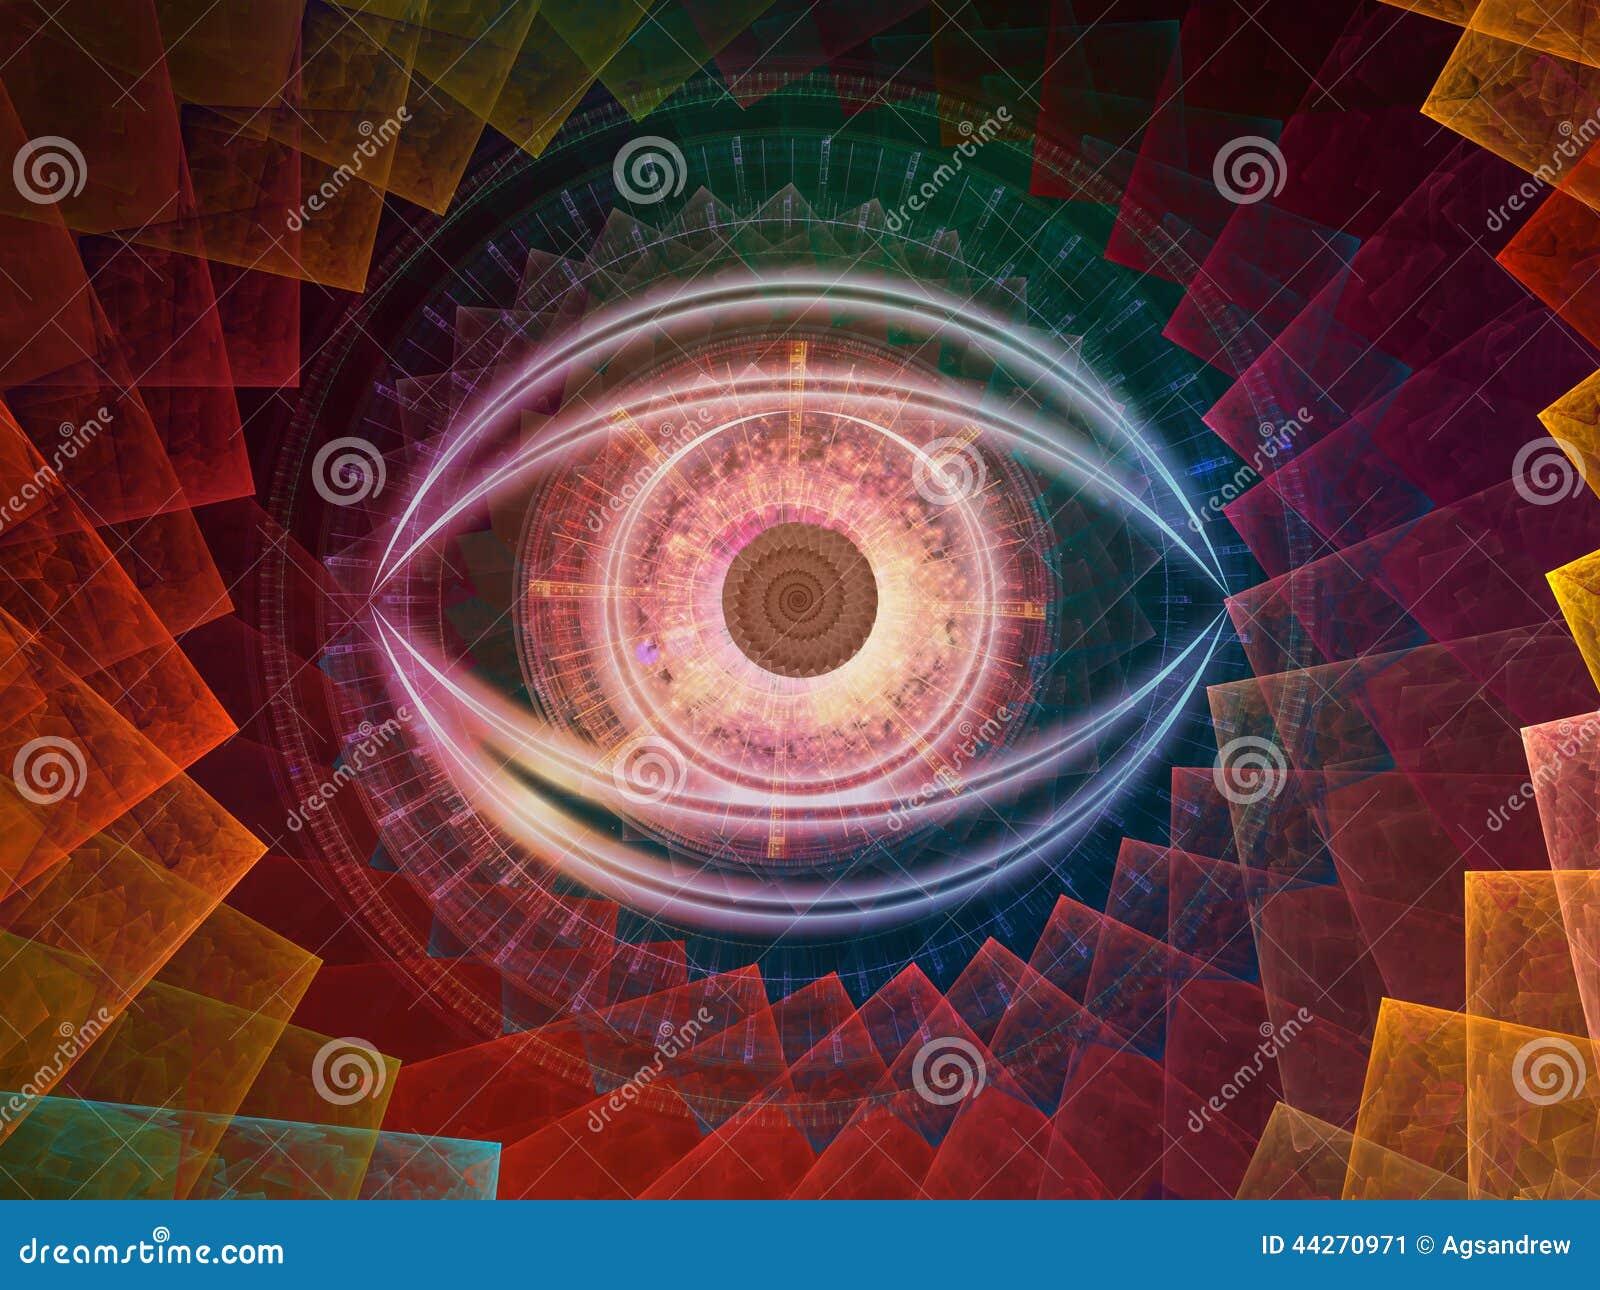 how to use talika eye dream